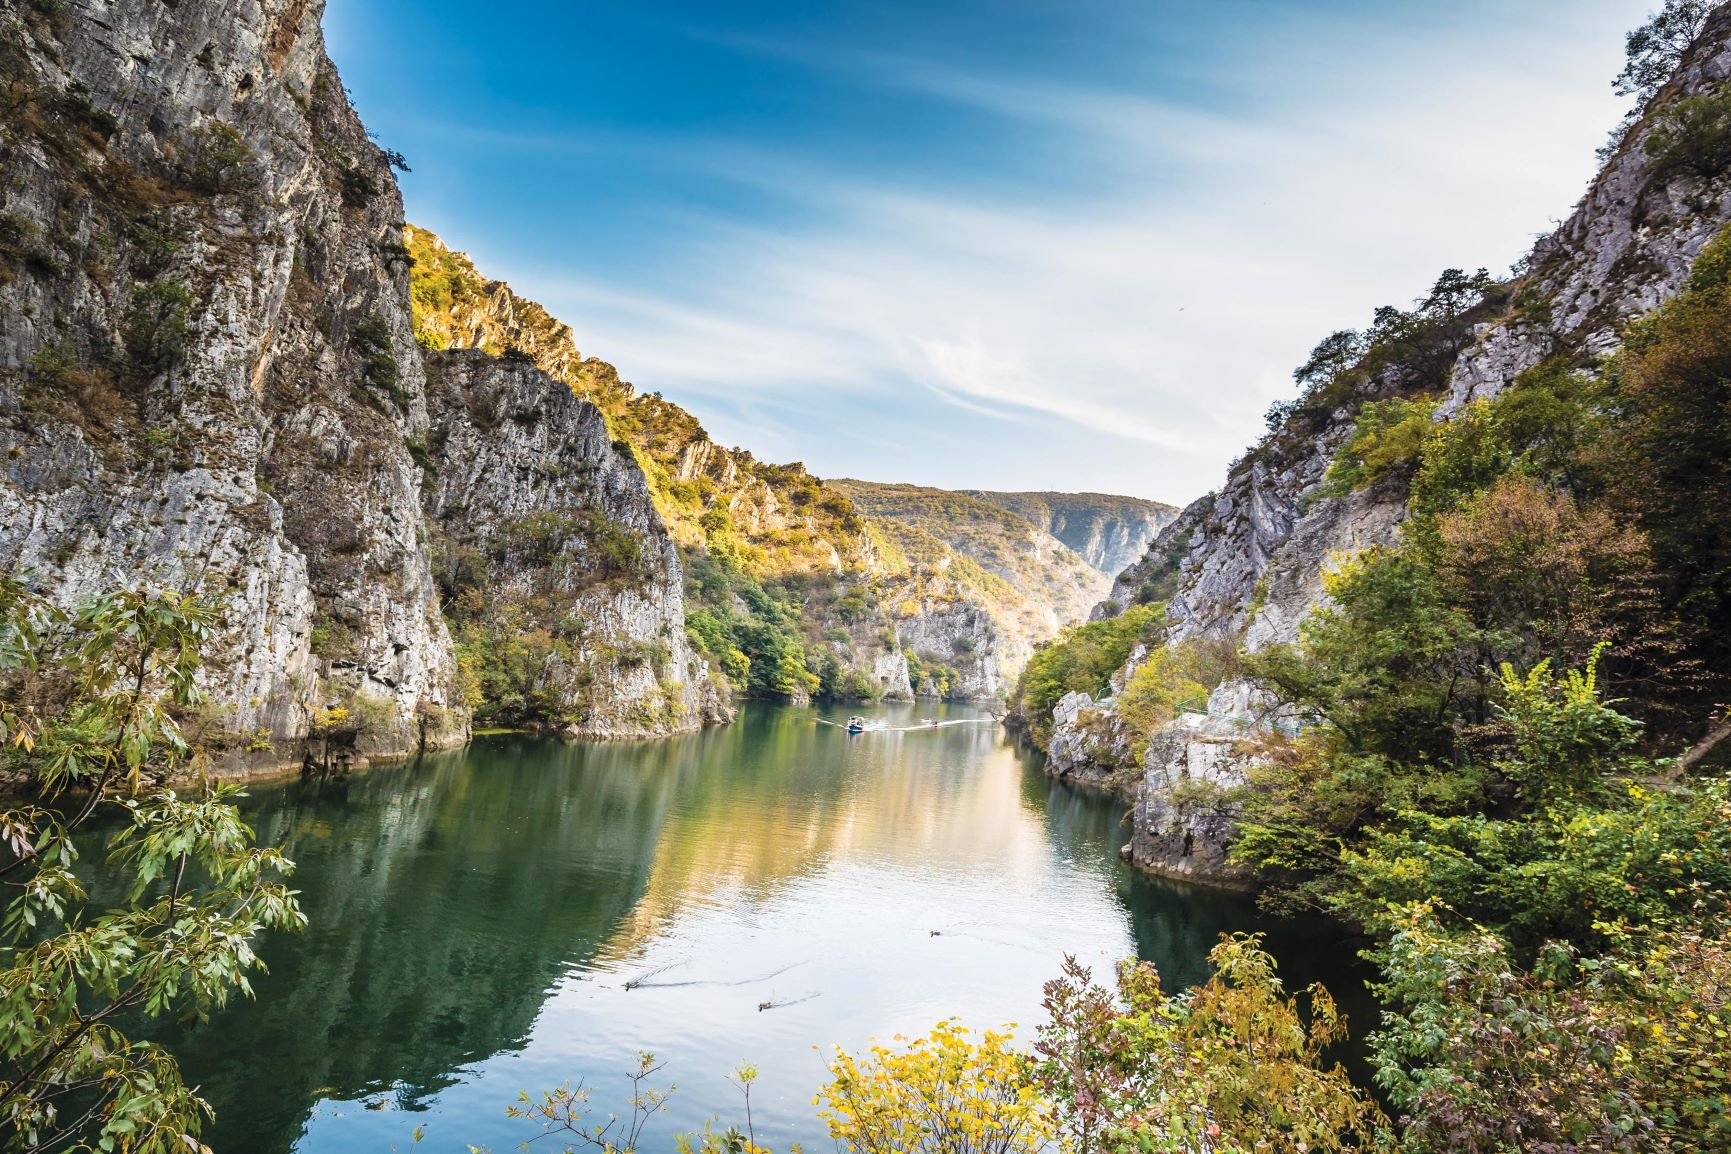 https://bsl.com.mt/wp-content/uploads/2021/04/Macedonia-1.jpg